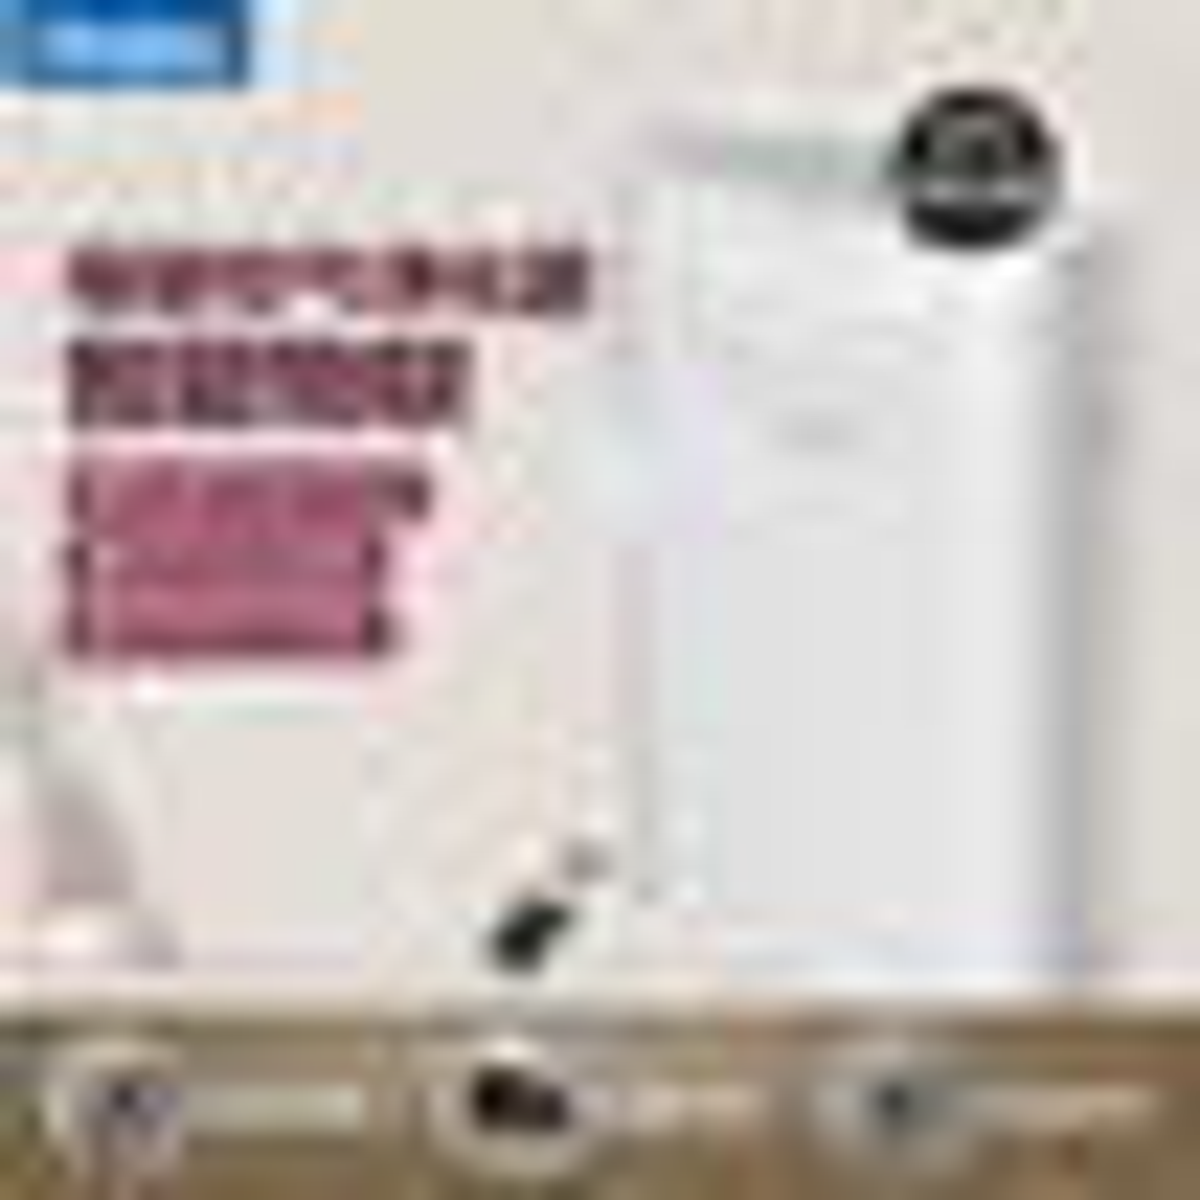 Haier/海尔 空气净化器 KJ225F-HY01(Z)母婴空气净化器